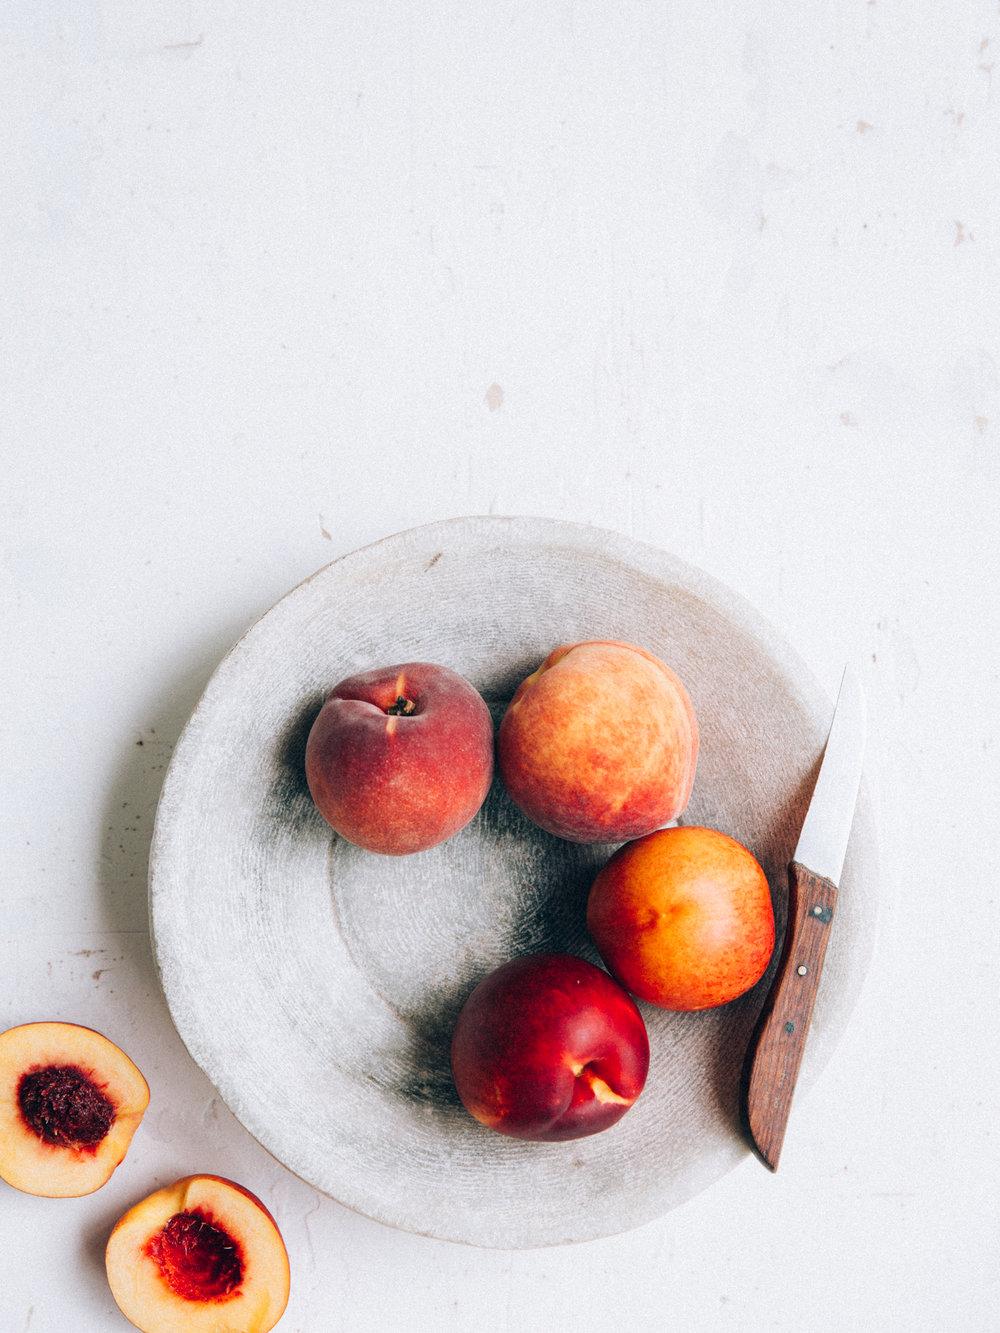 erinscottphotography_food1-36.jpg